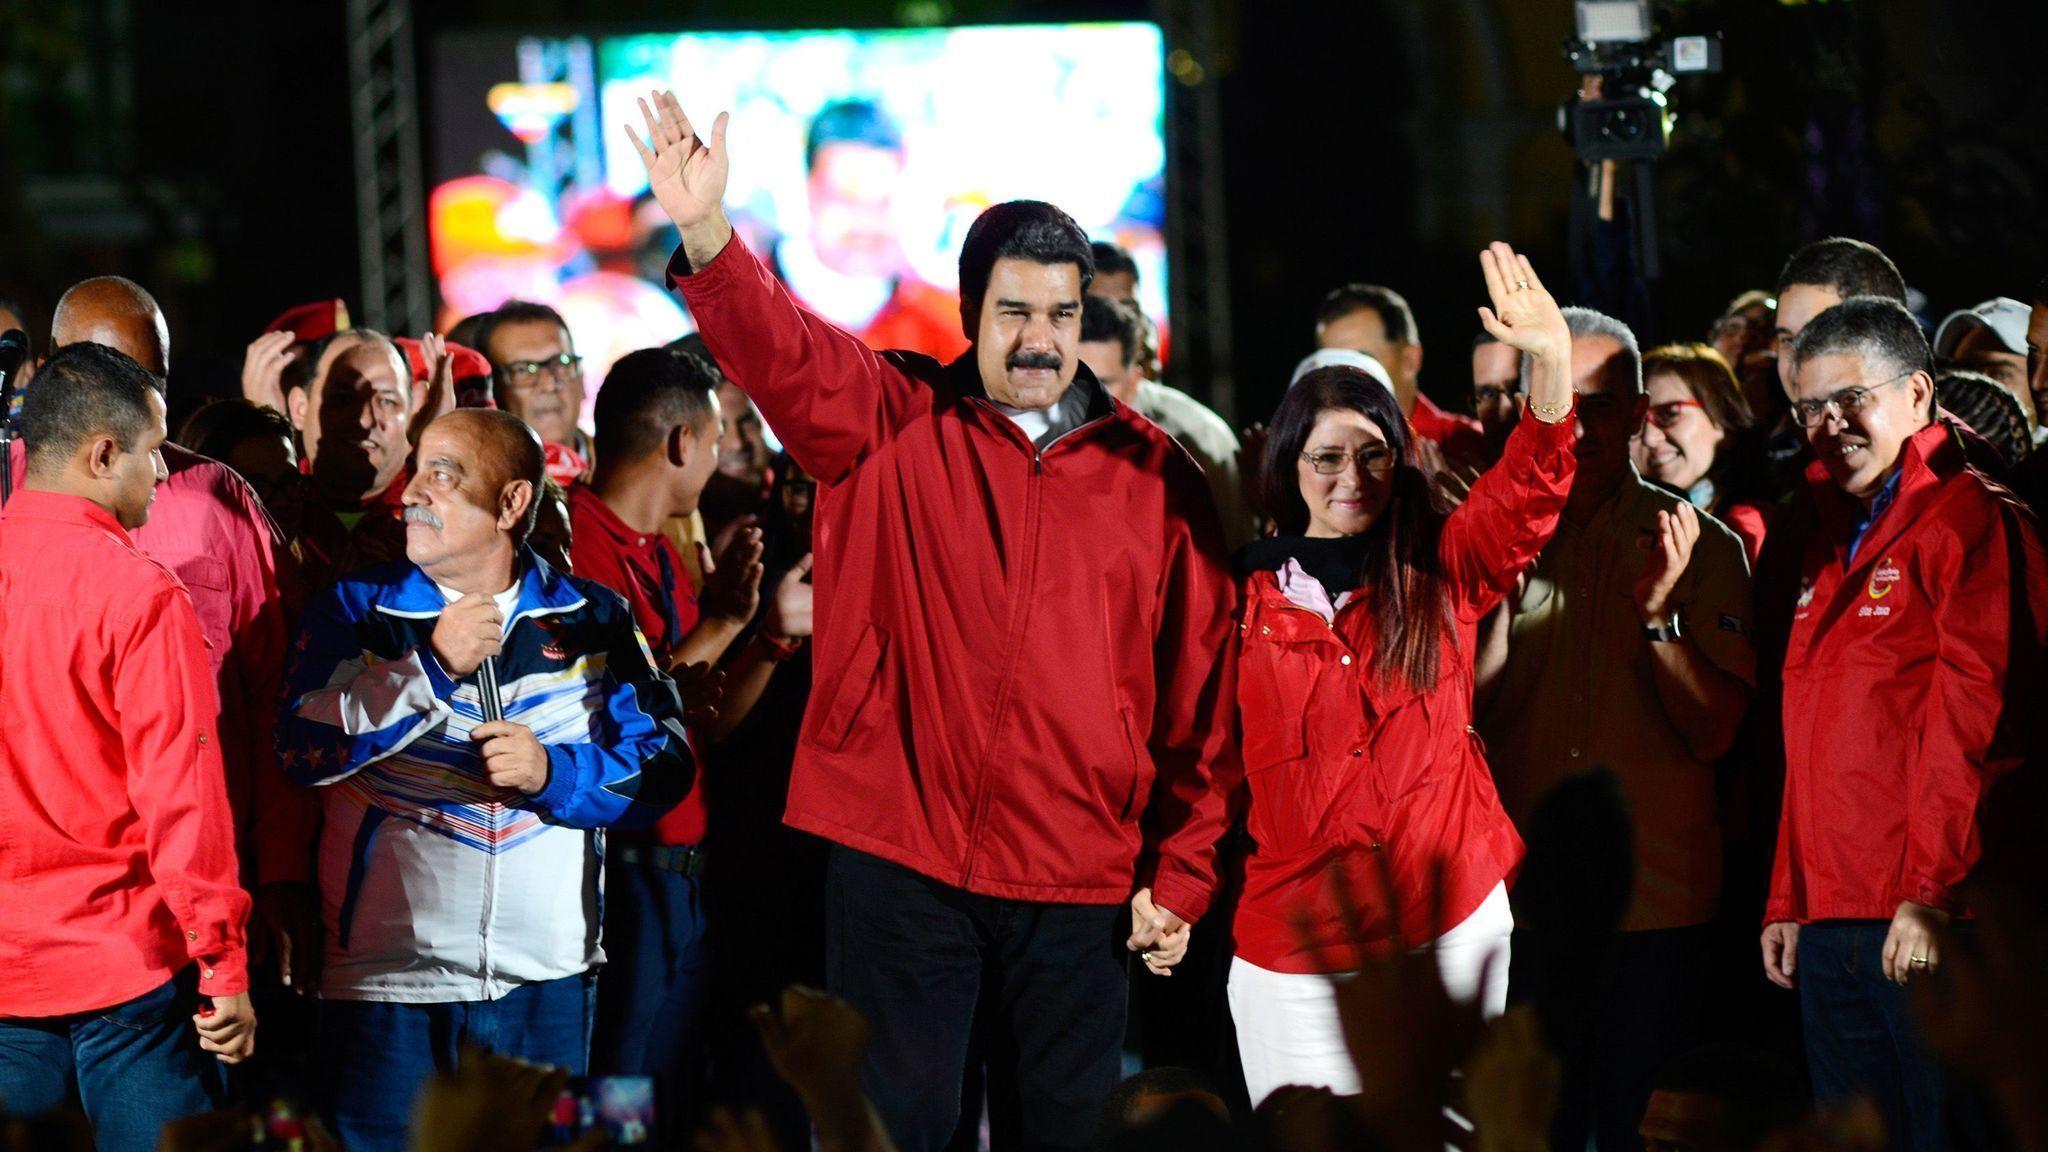 Venezuela's political crisis deepens as its legislature is essentially dissolved